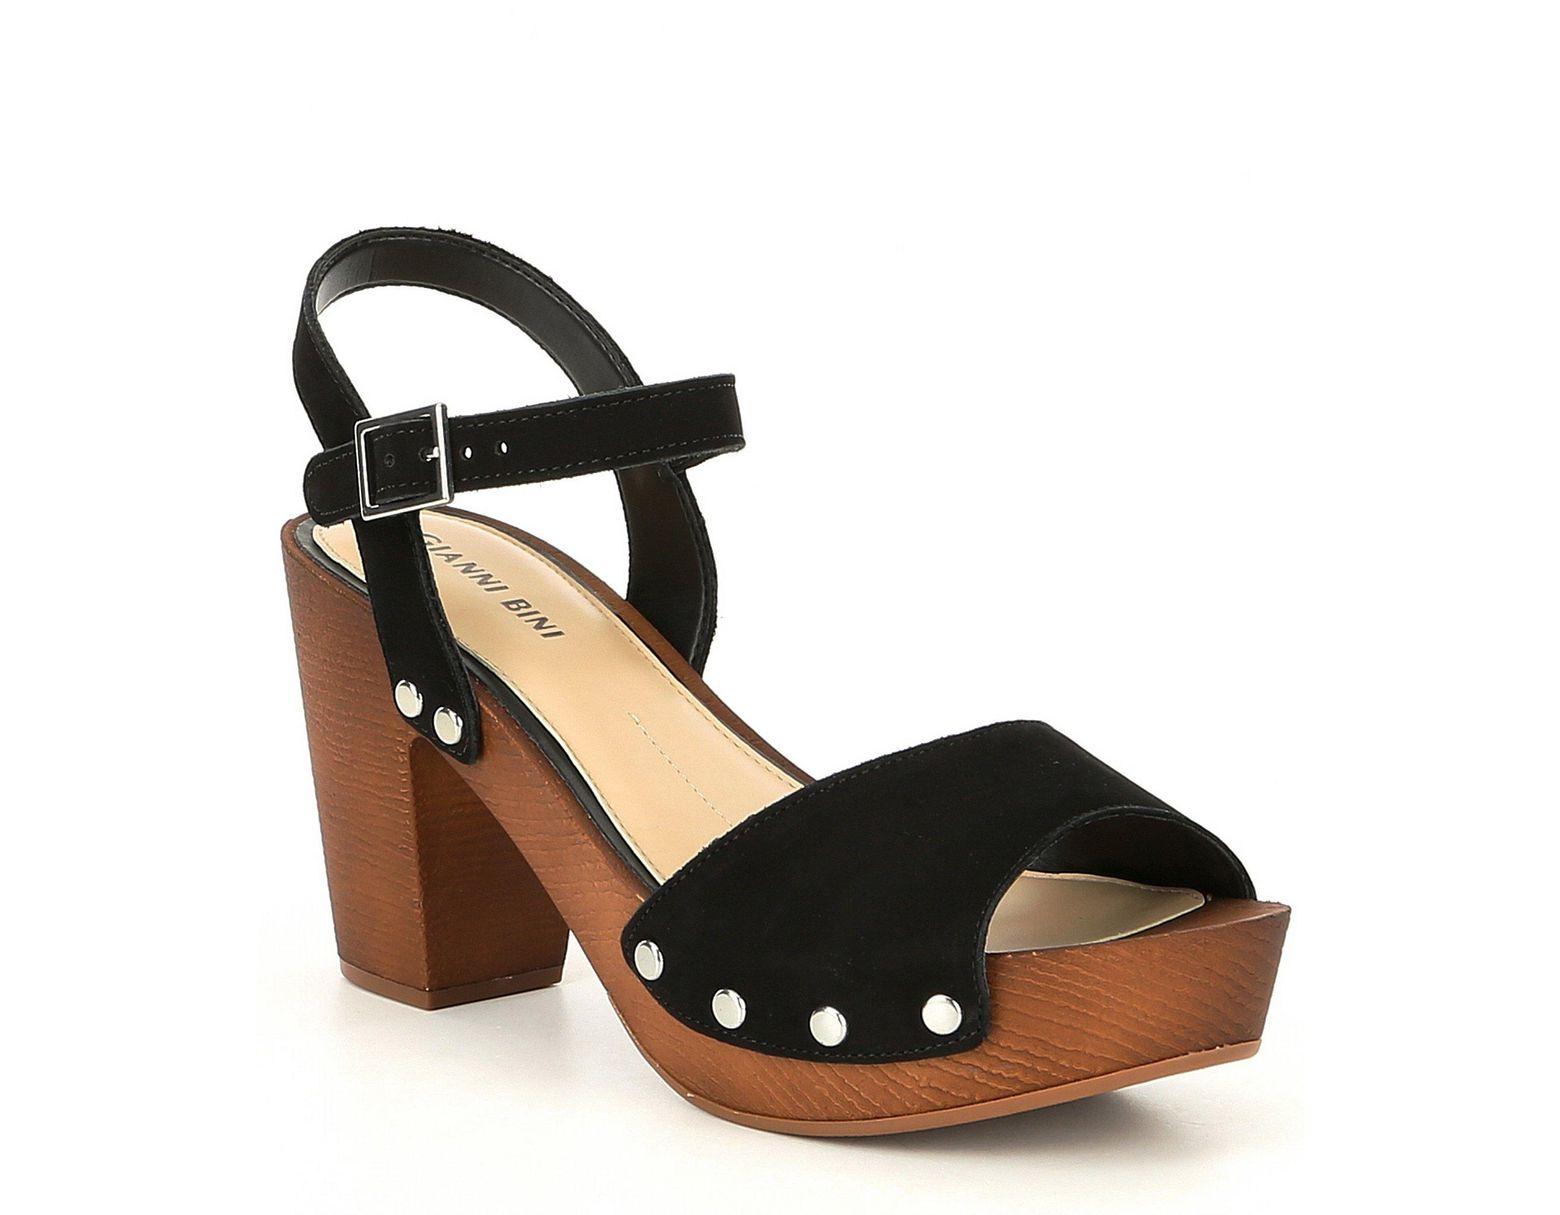 f8c00883a3ee7 Gianni Bini Renella Nubuck Two-strap Wood Platform Block Heel Sandals in  Black - Lyst